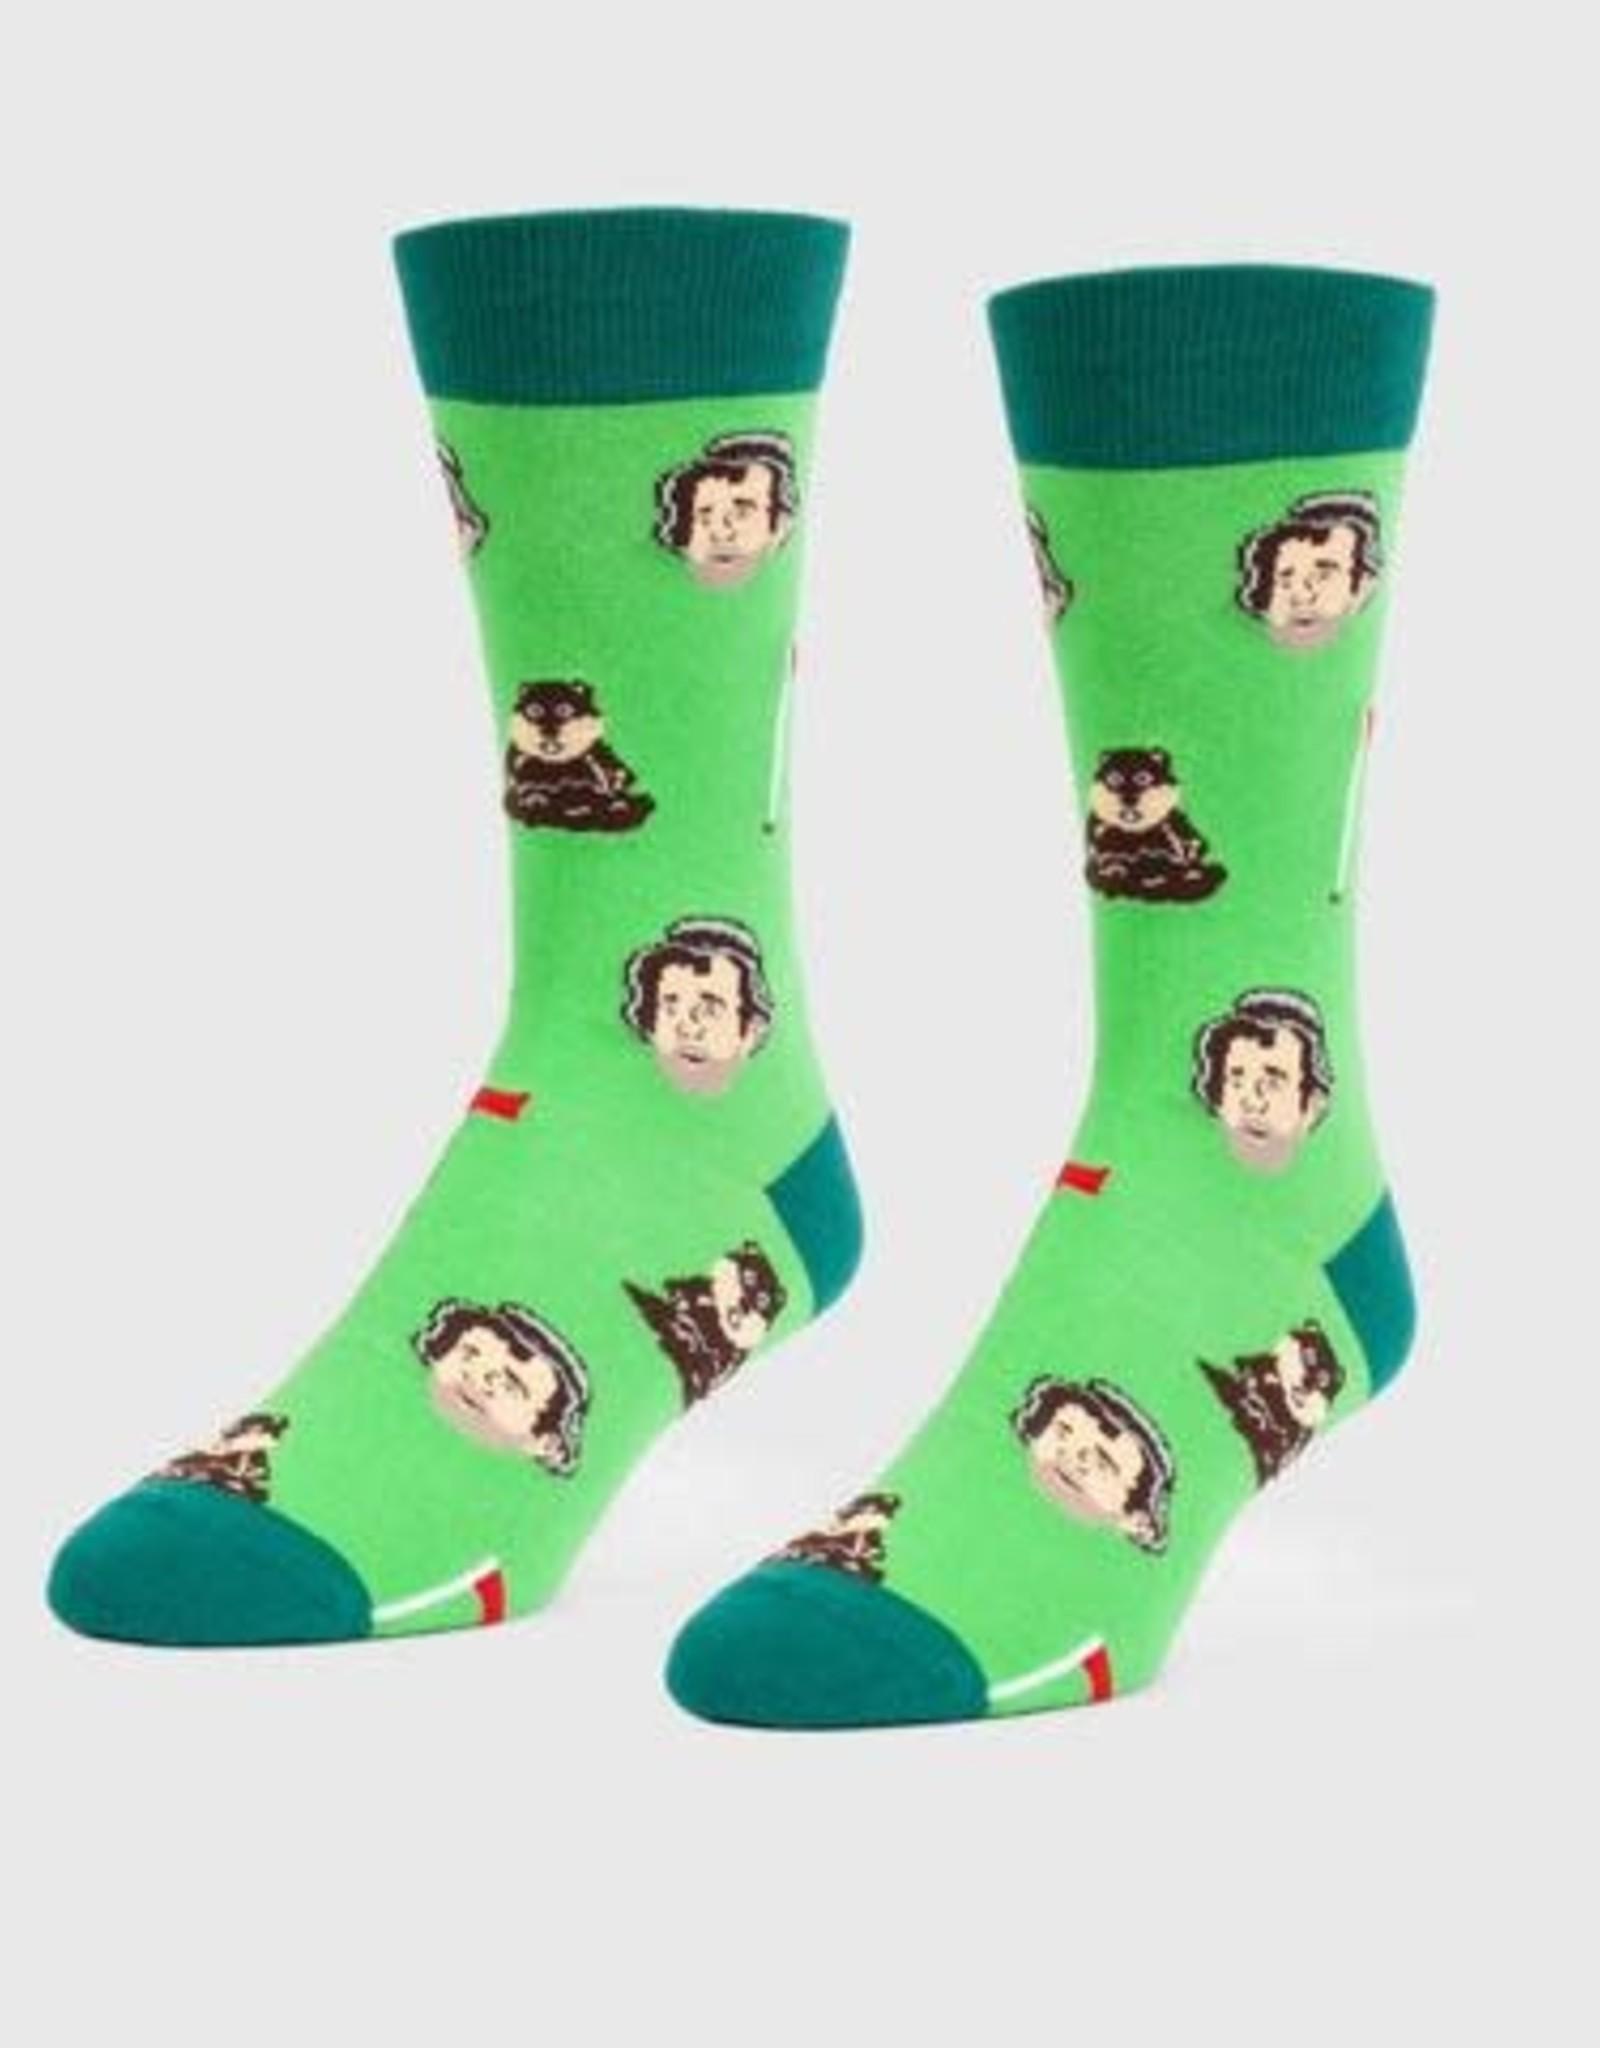 Socks (Unisex) L/XL - Freeze Gopher Caddyshack